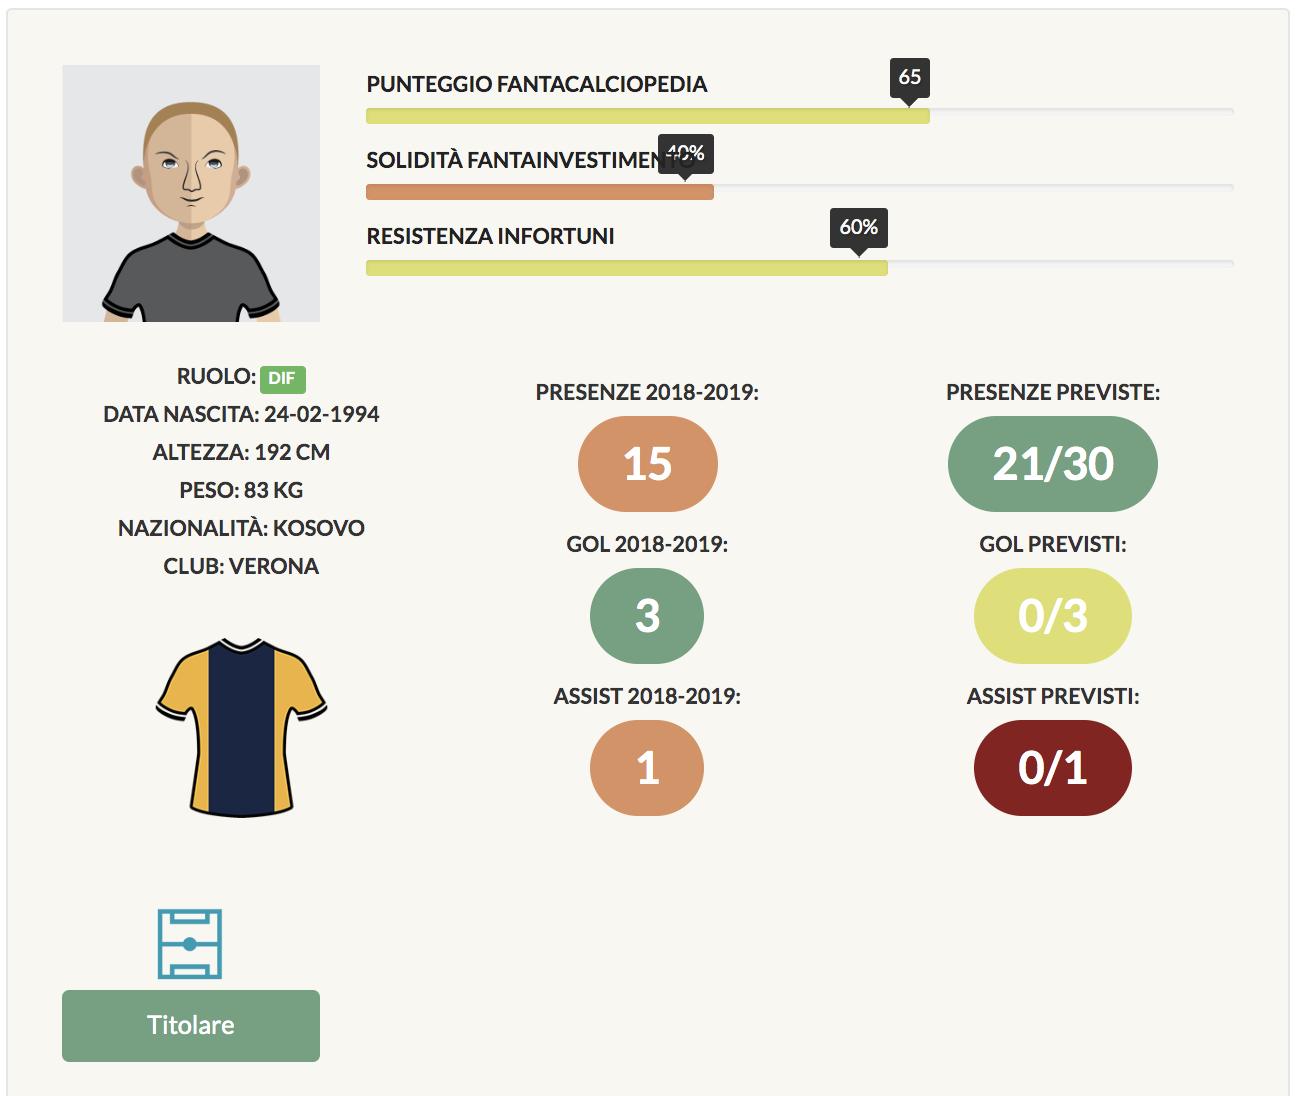 rrahmani infografica fantacalcio 2019/20